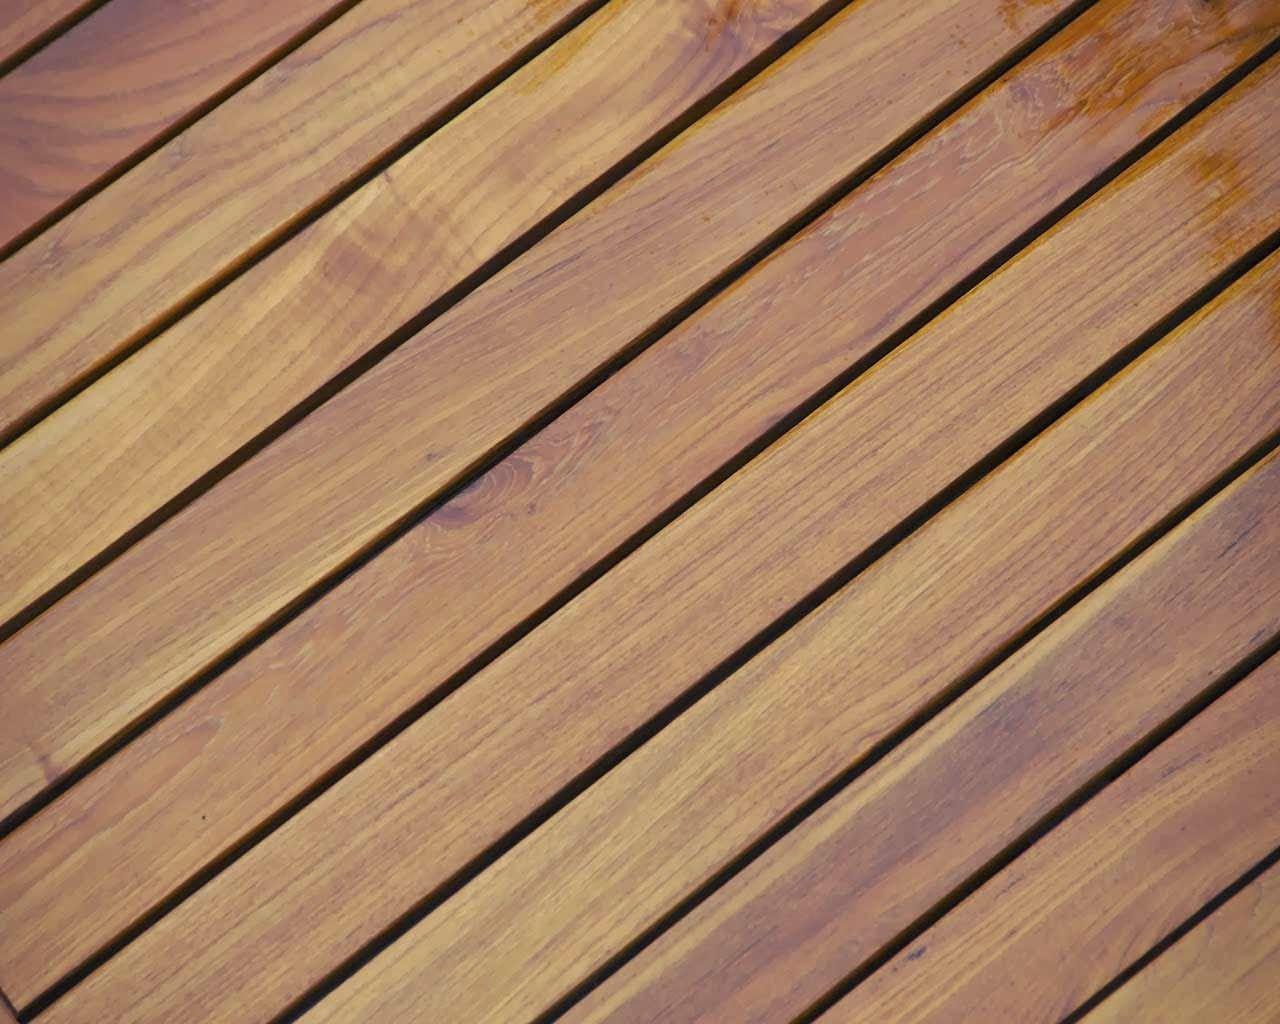 26 Background Kayu Keren Hd Gambar Keren Hd Wooden Wallpaper Free Wood Texture Wood Grain Vector